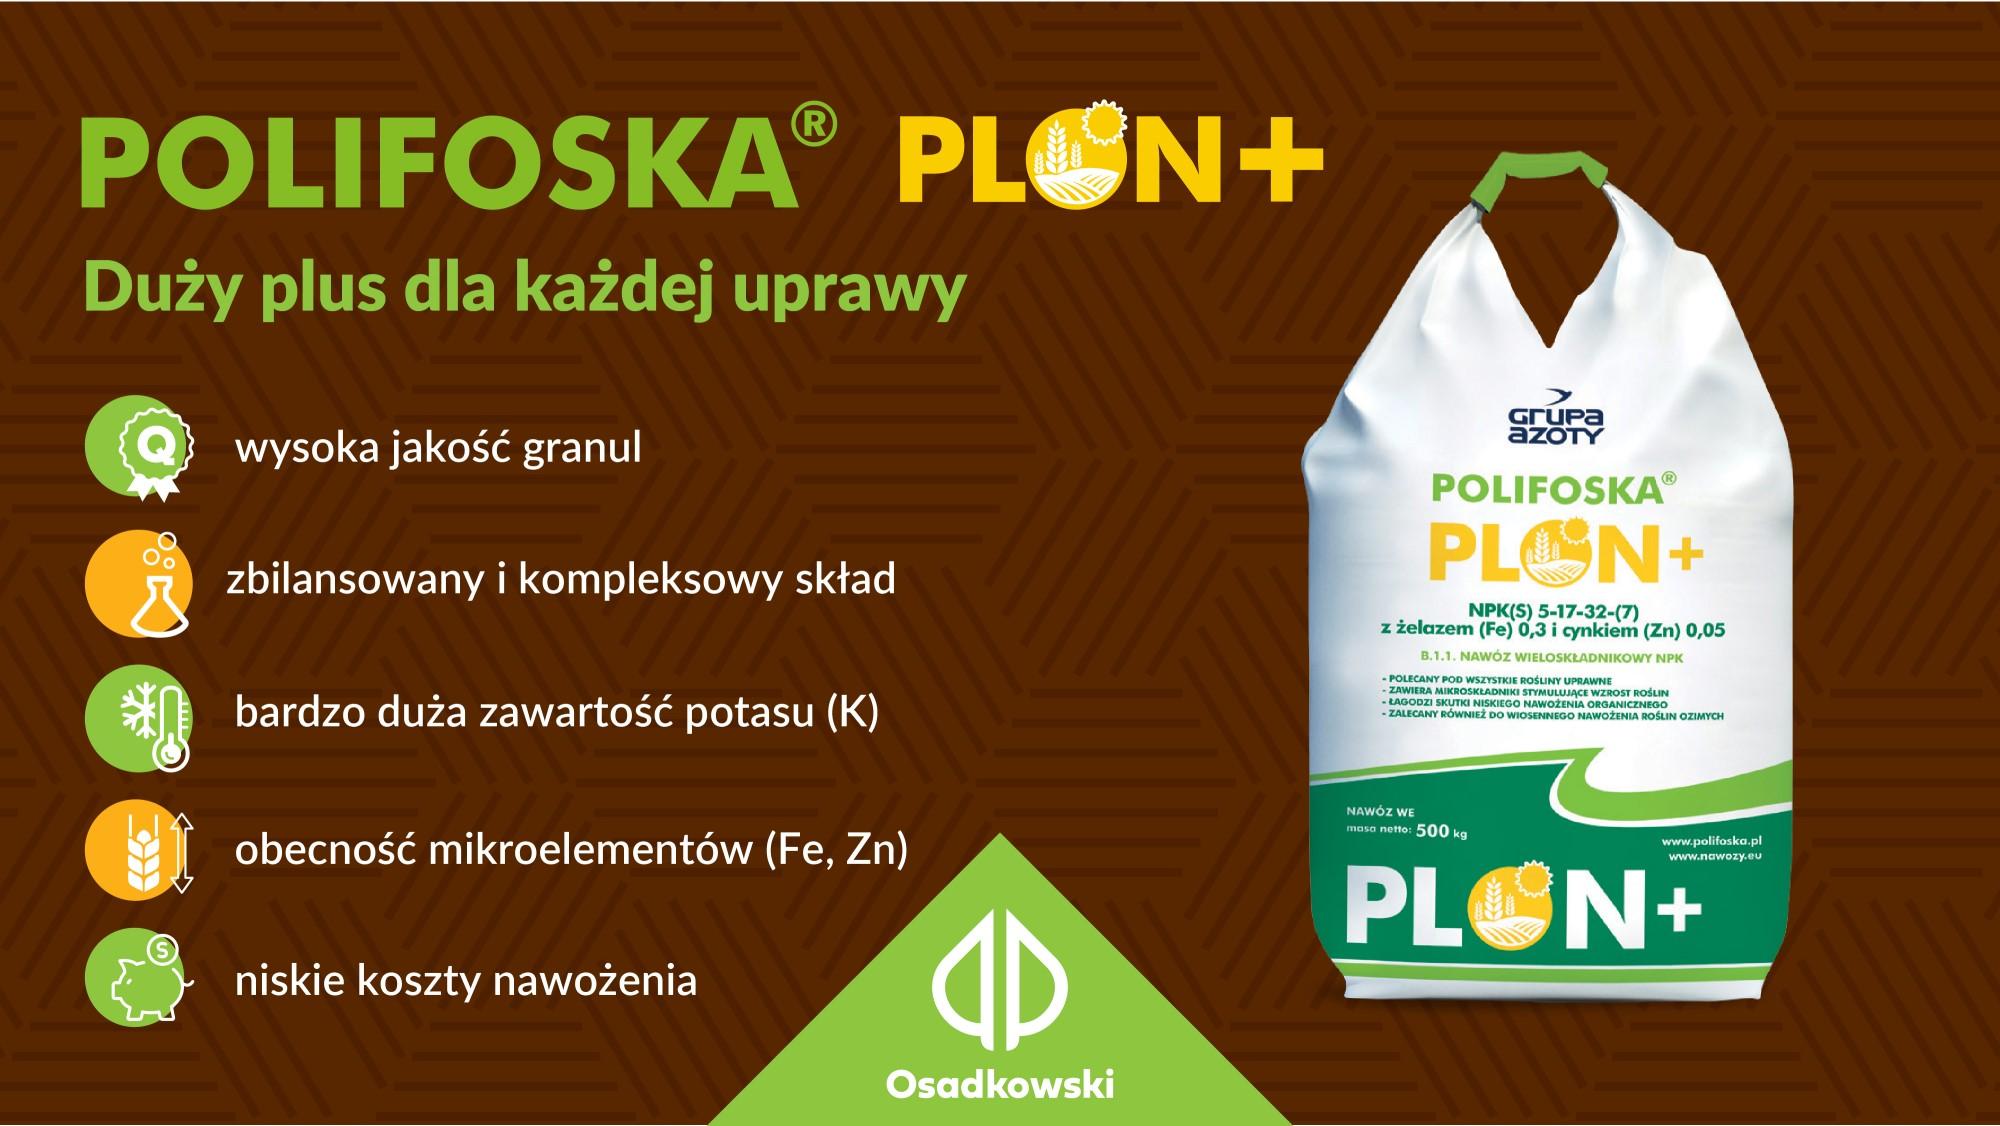 Polifoska Plon+